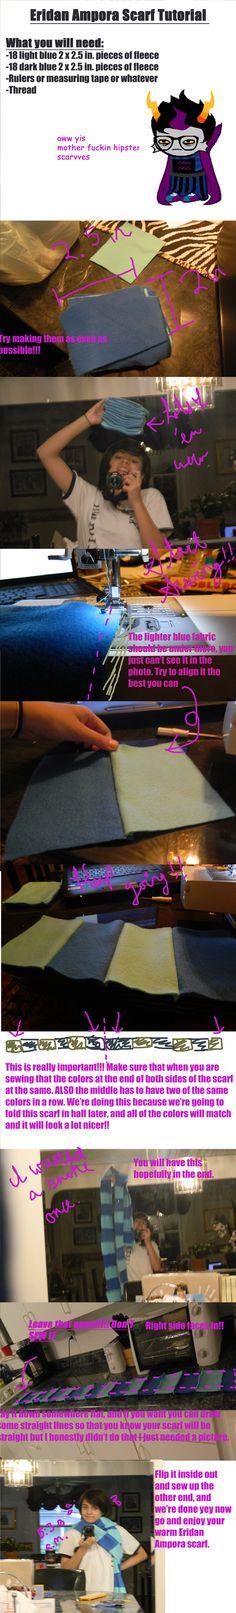 Homestuck Eridan/RoxyScarf Tutorial by GentlemanlySpam.deviantart.com on @deviantART need a new scarf? make it homestuck!